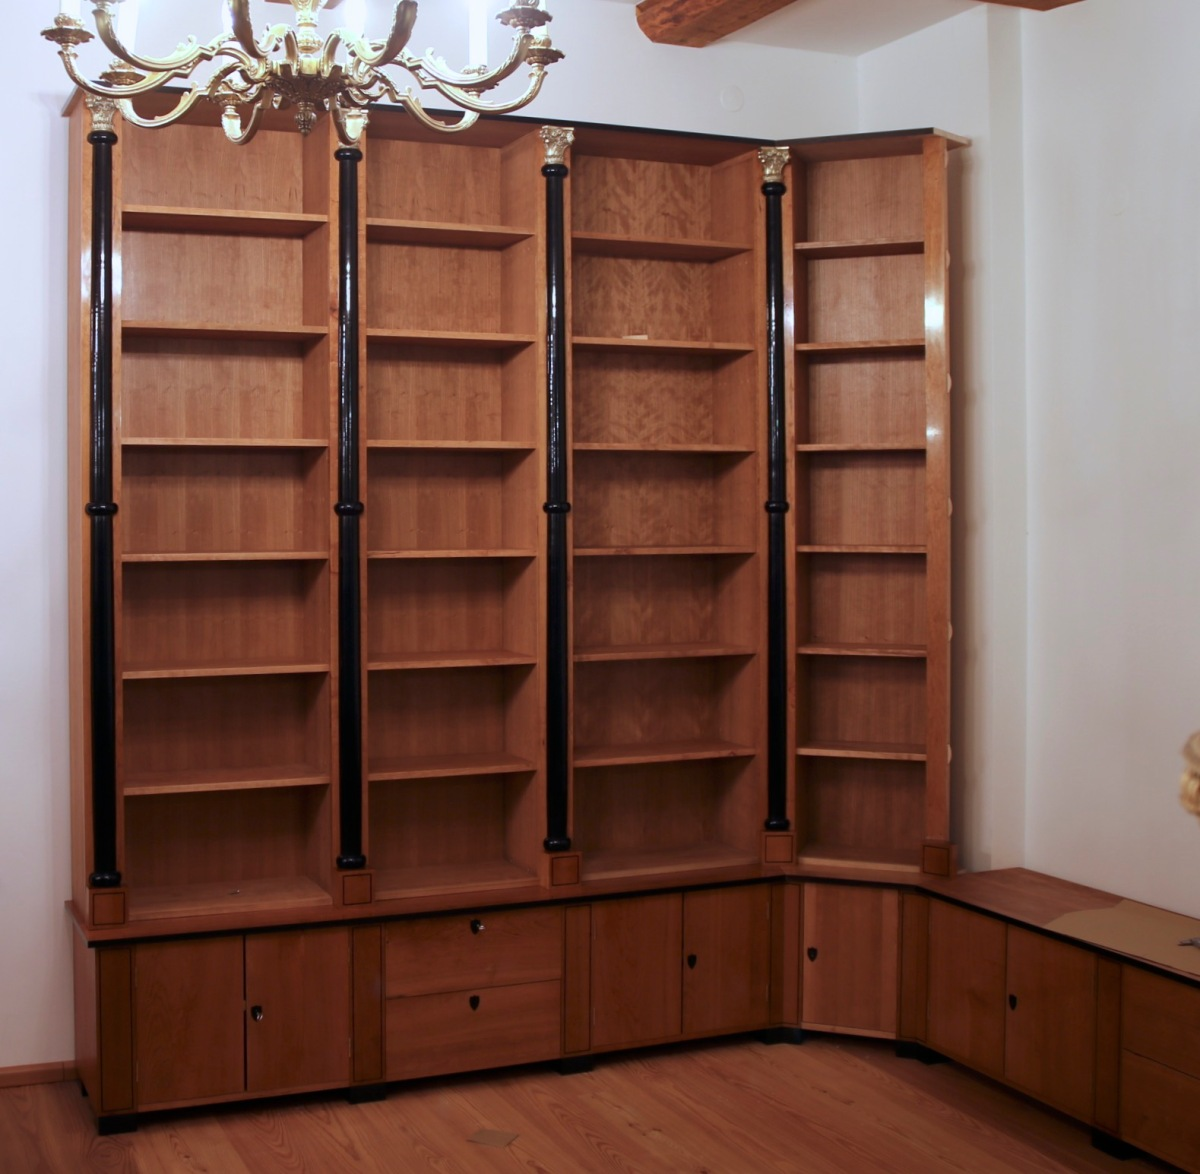 das ende naht rainerspeer. Black Bedroom Furniture Sets. Home Design Ideas